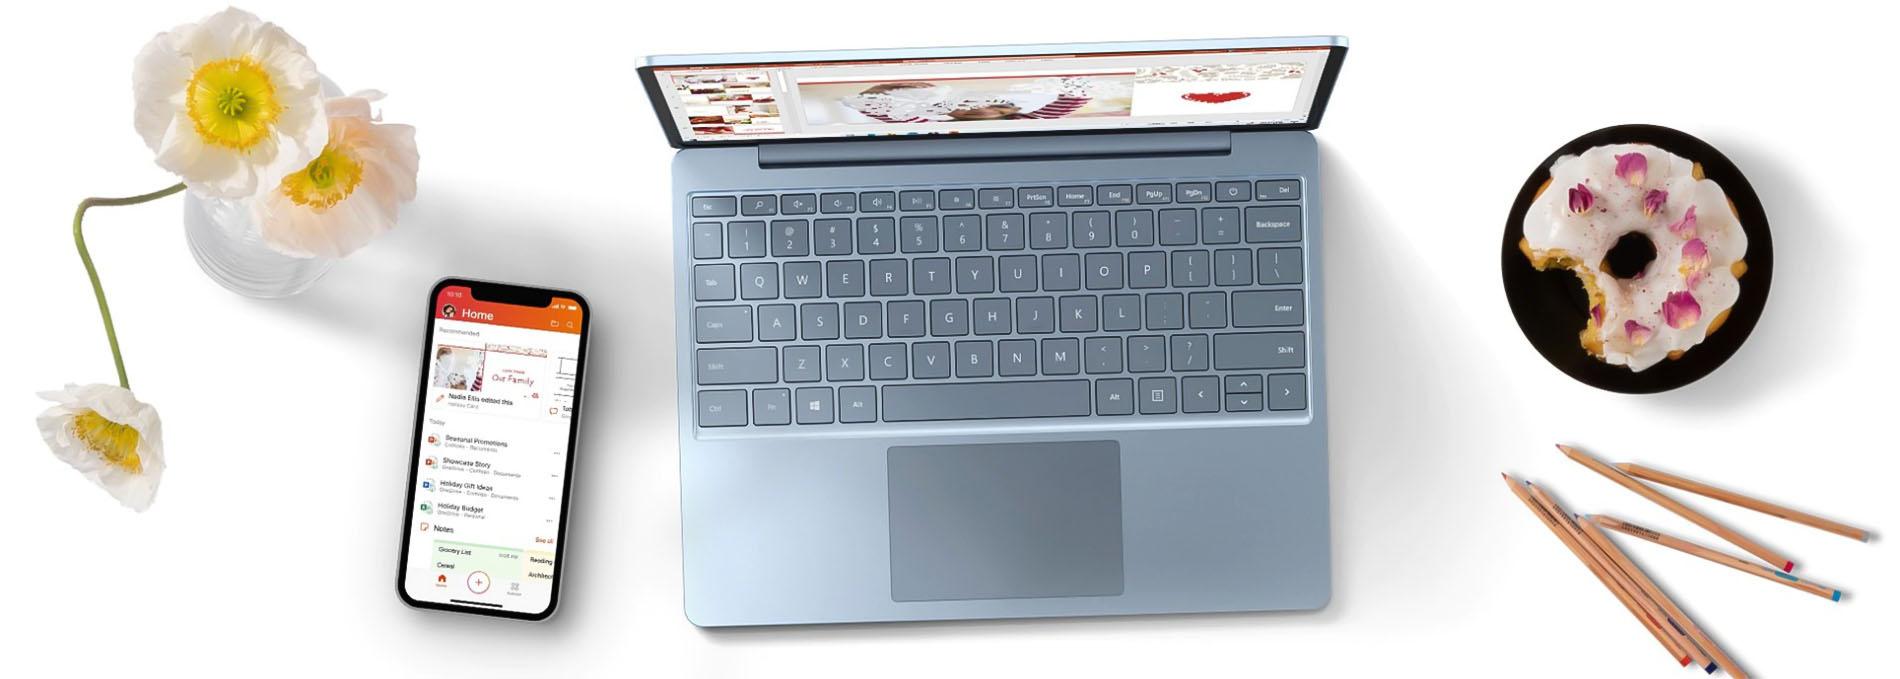 SurfaceLaptopGo Value